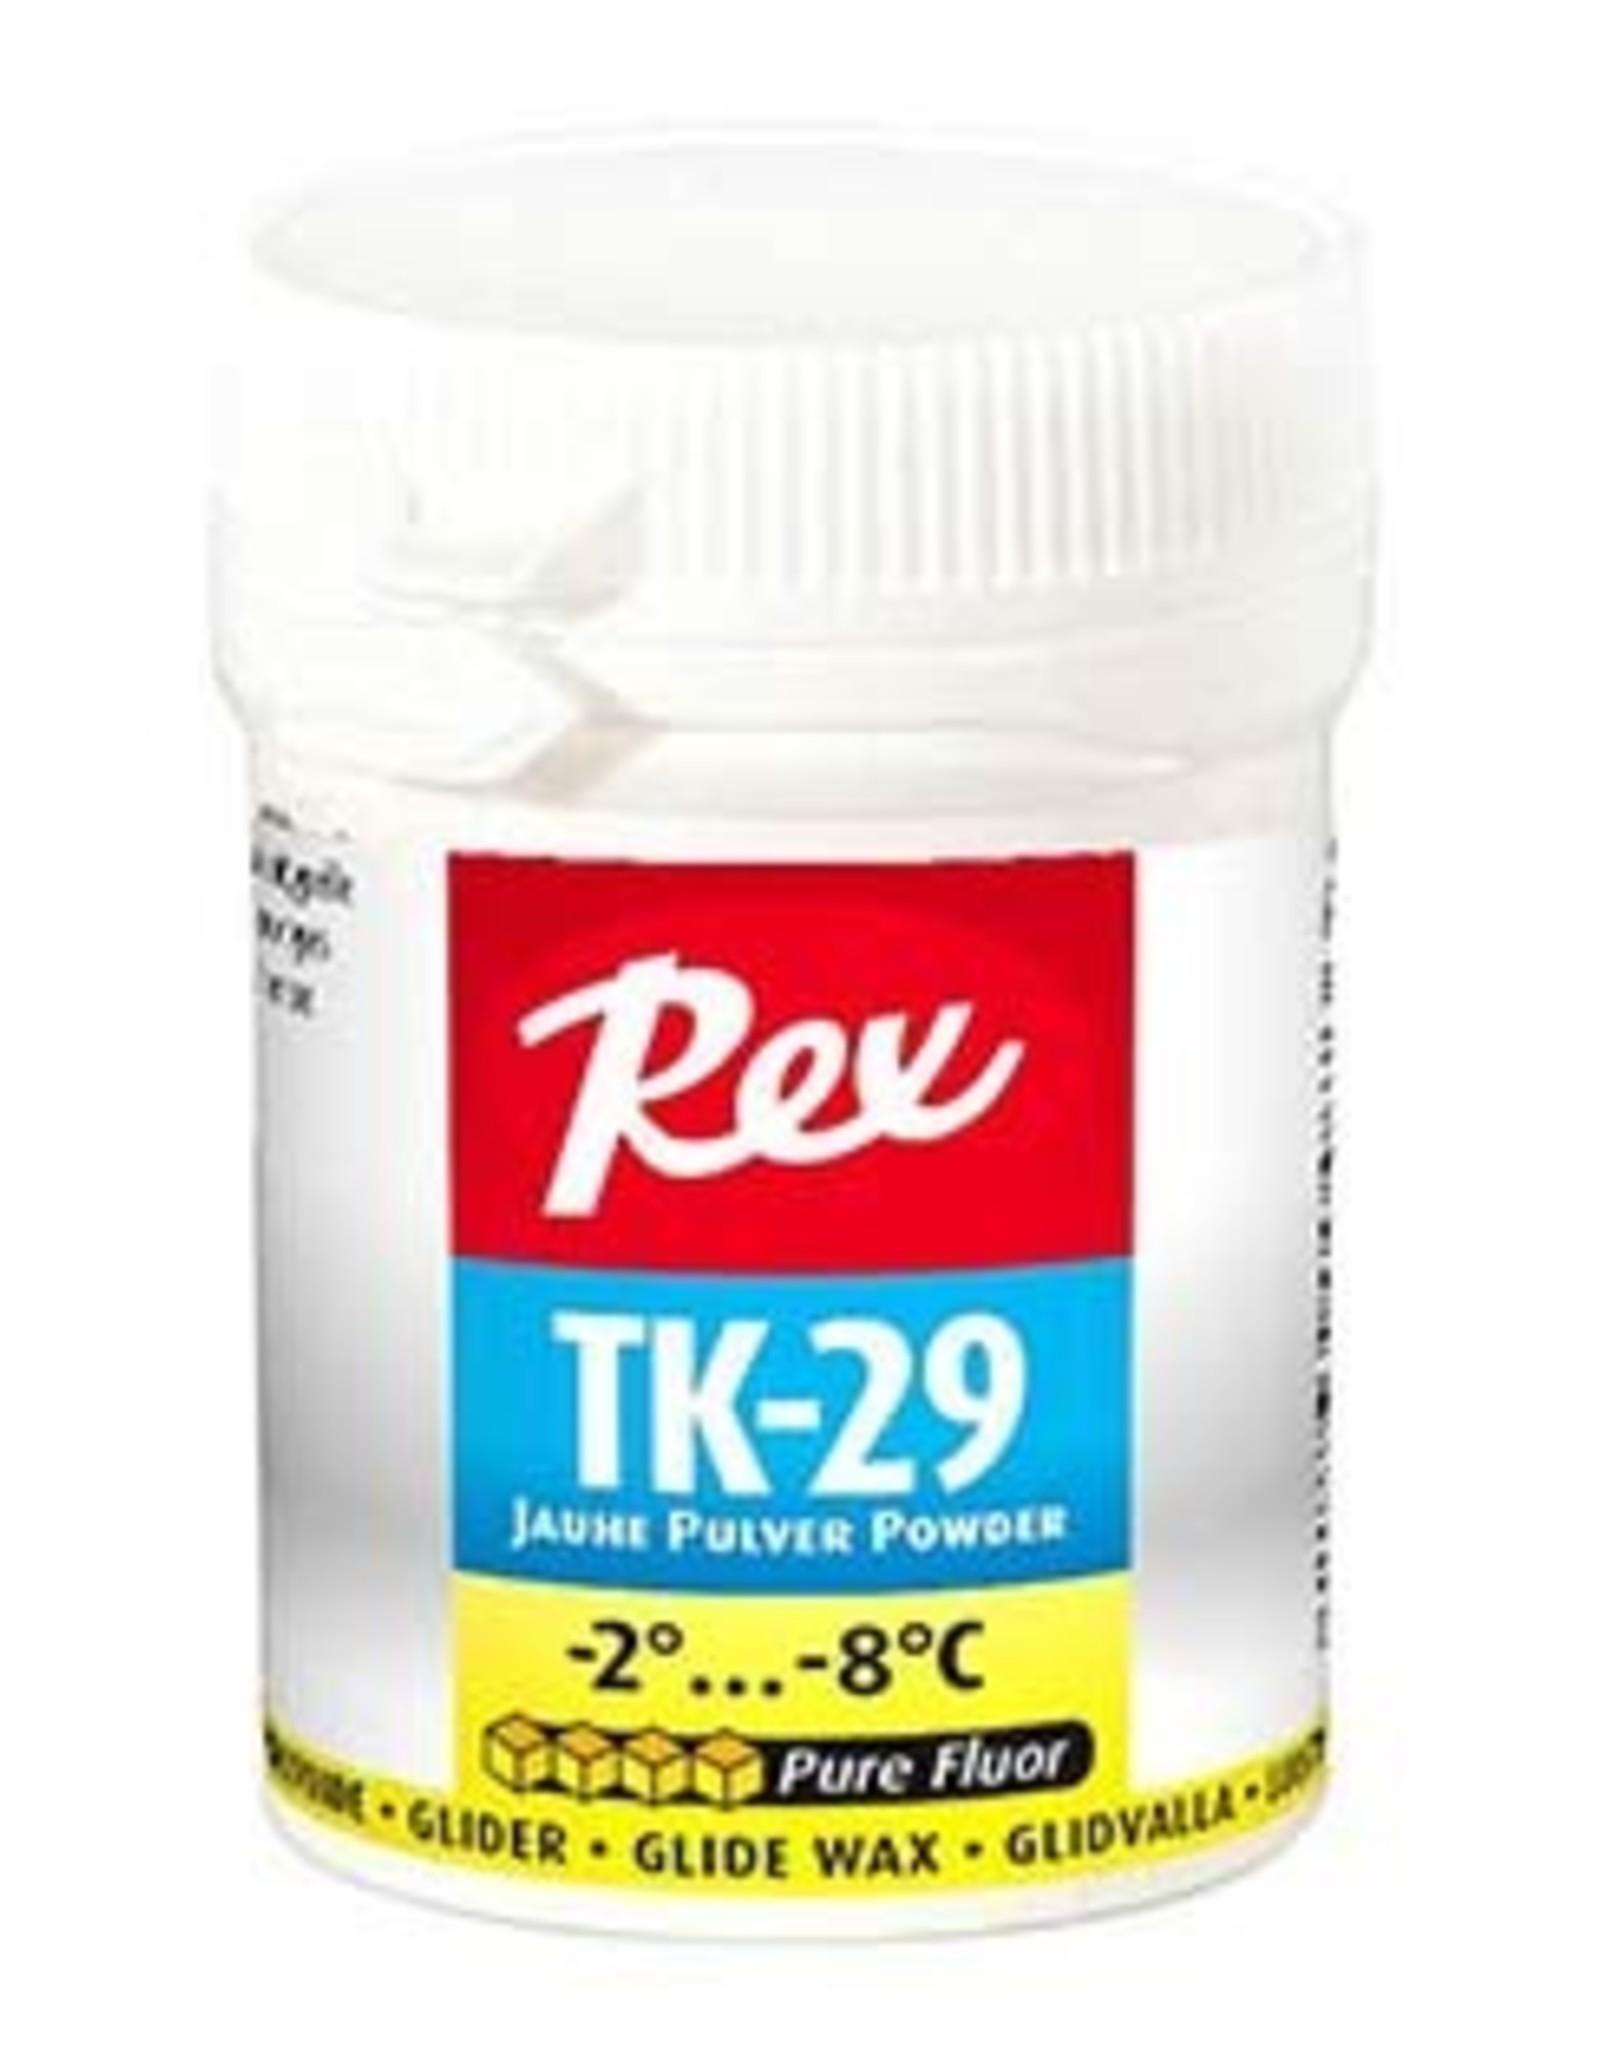 Rex TK-29 Fluoro Powder 30g